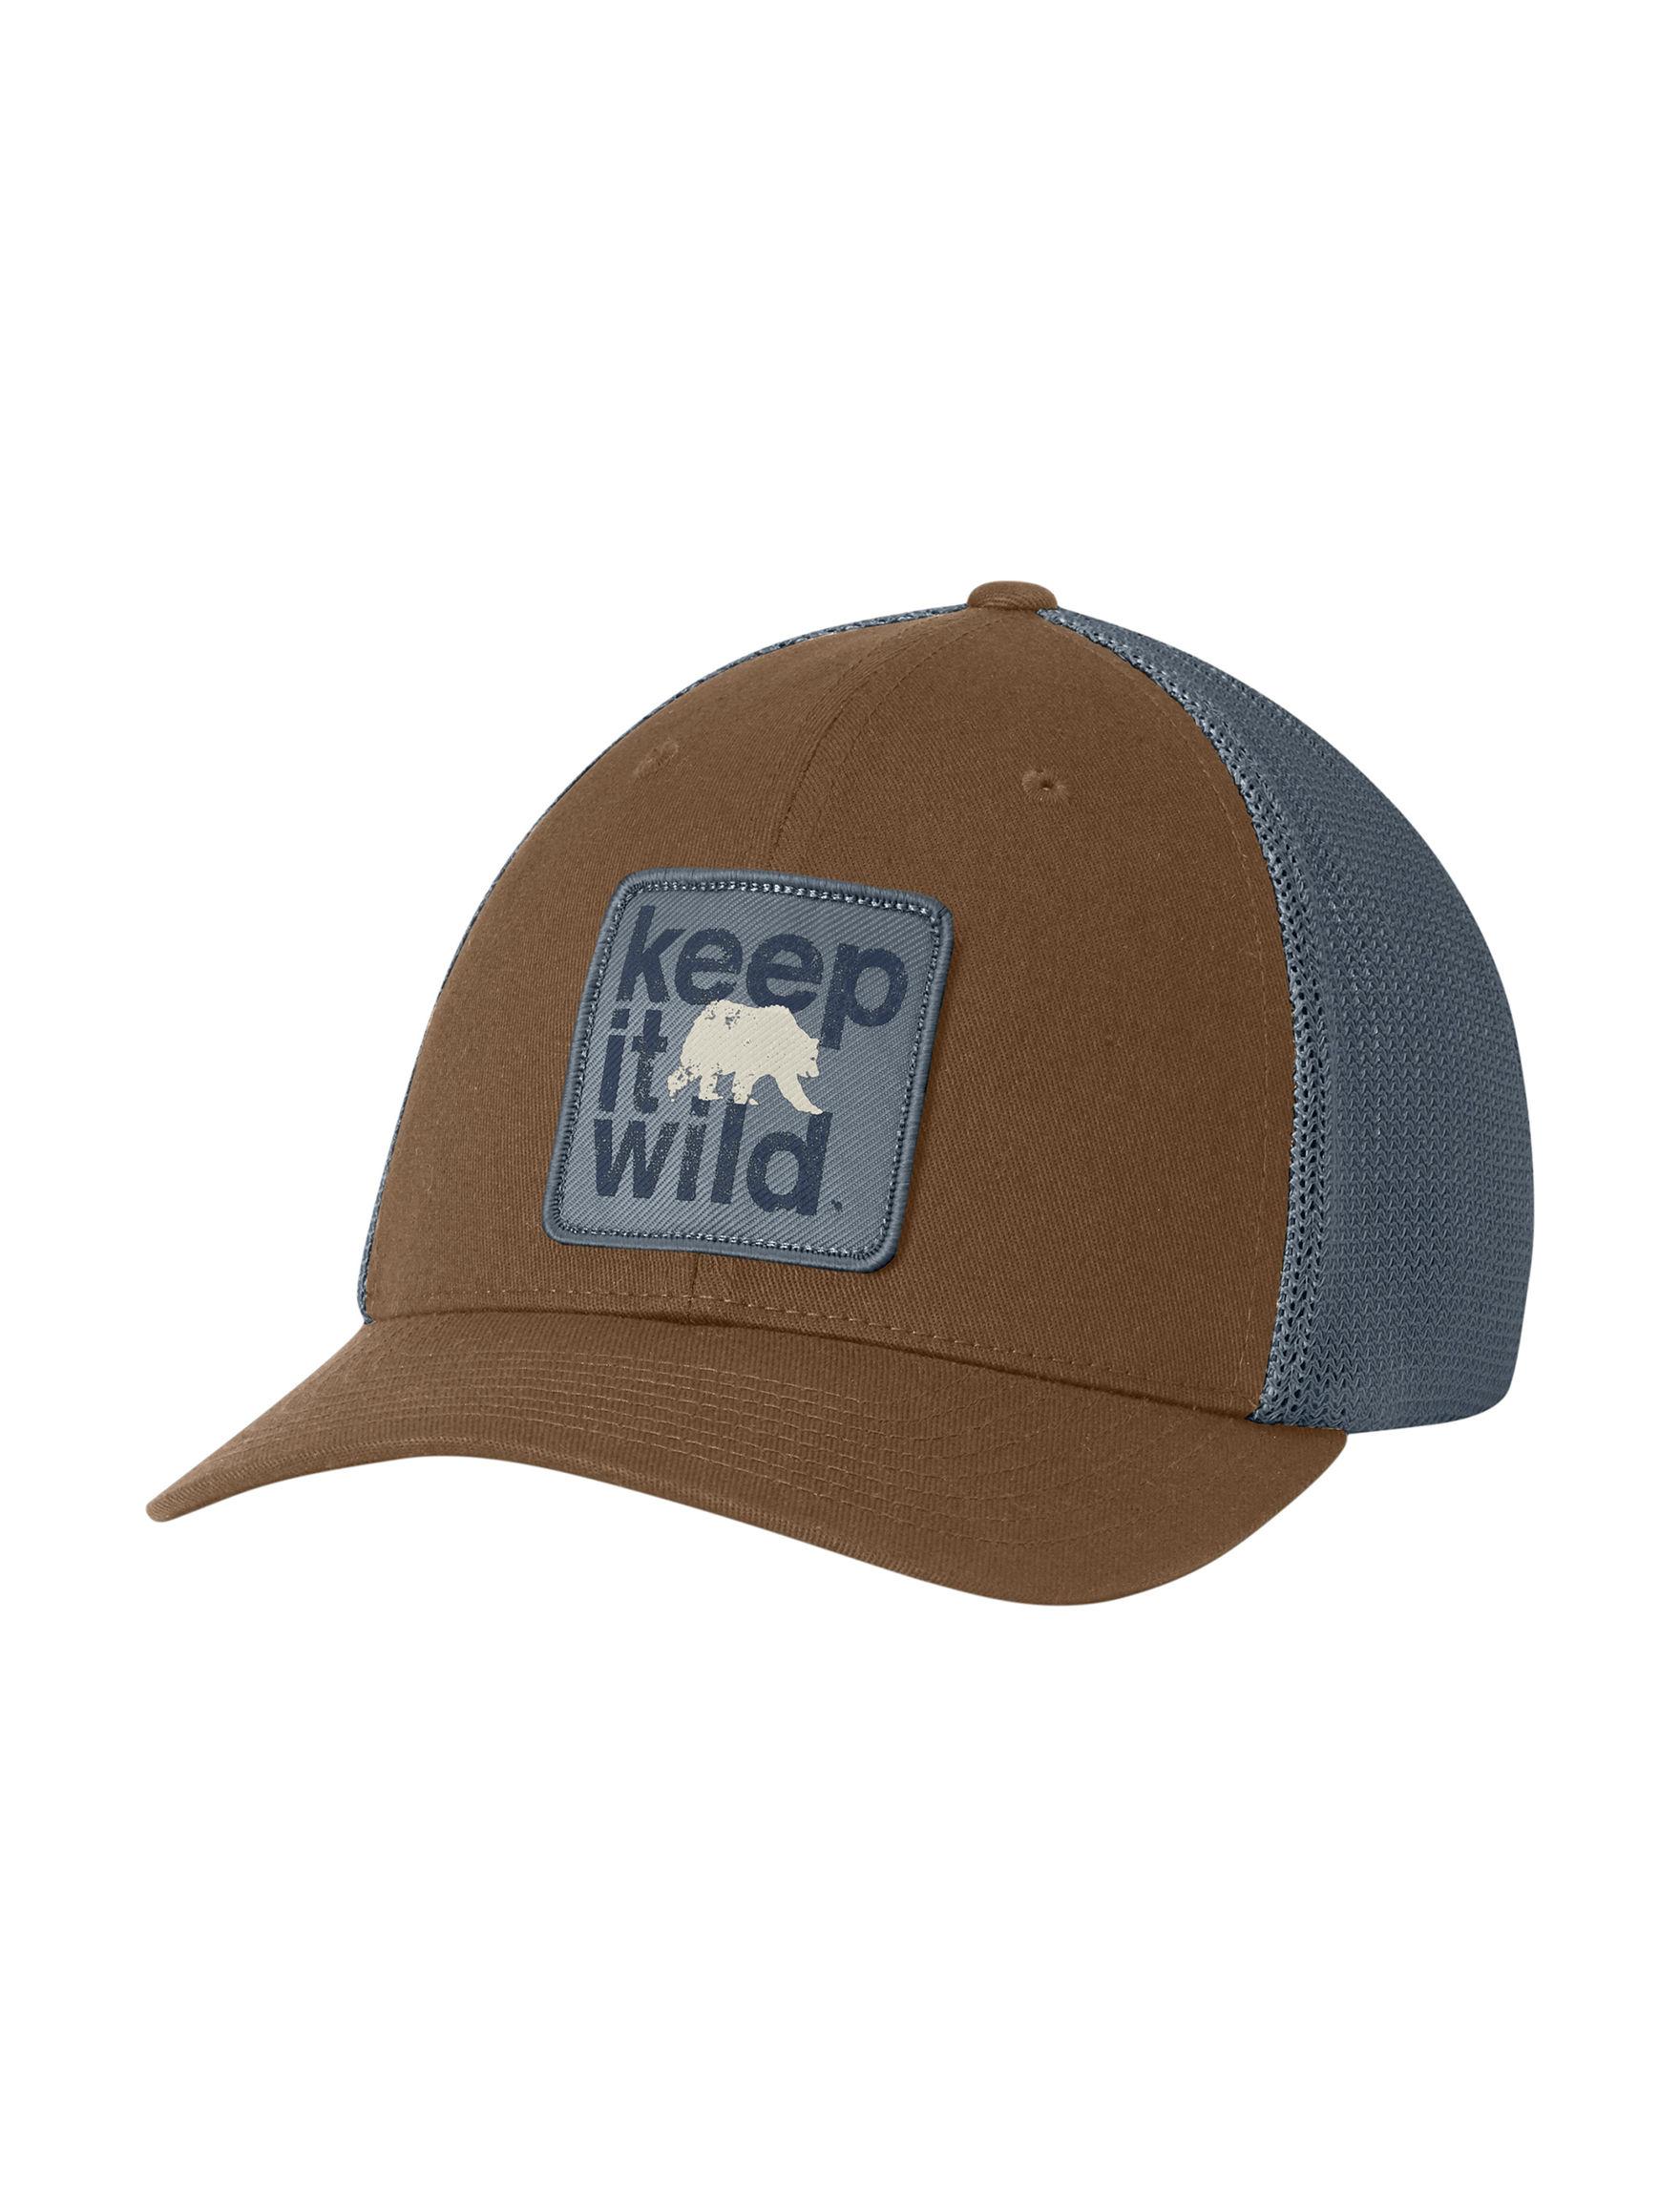 Columbia Brown / Grey Hats & Headwear